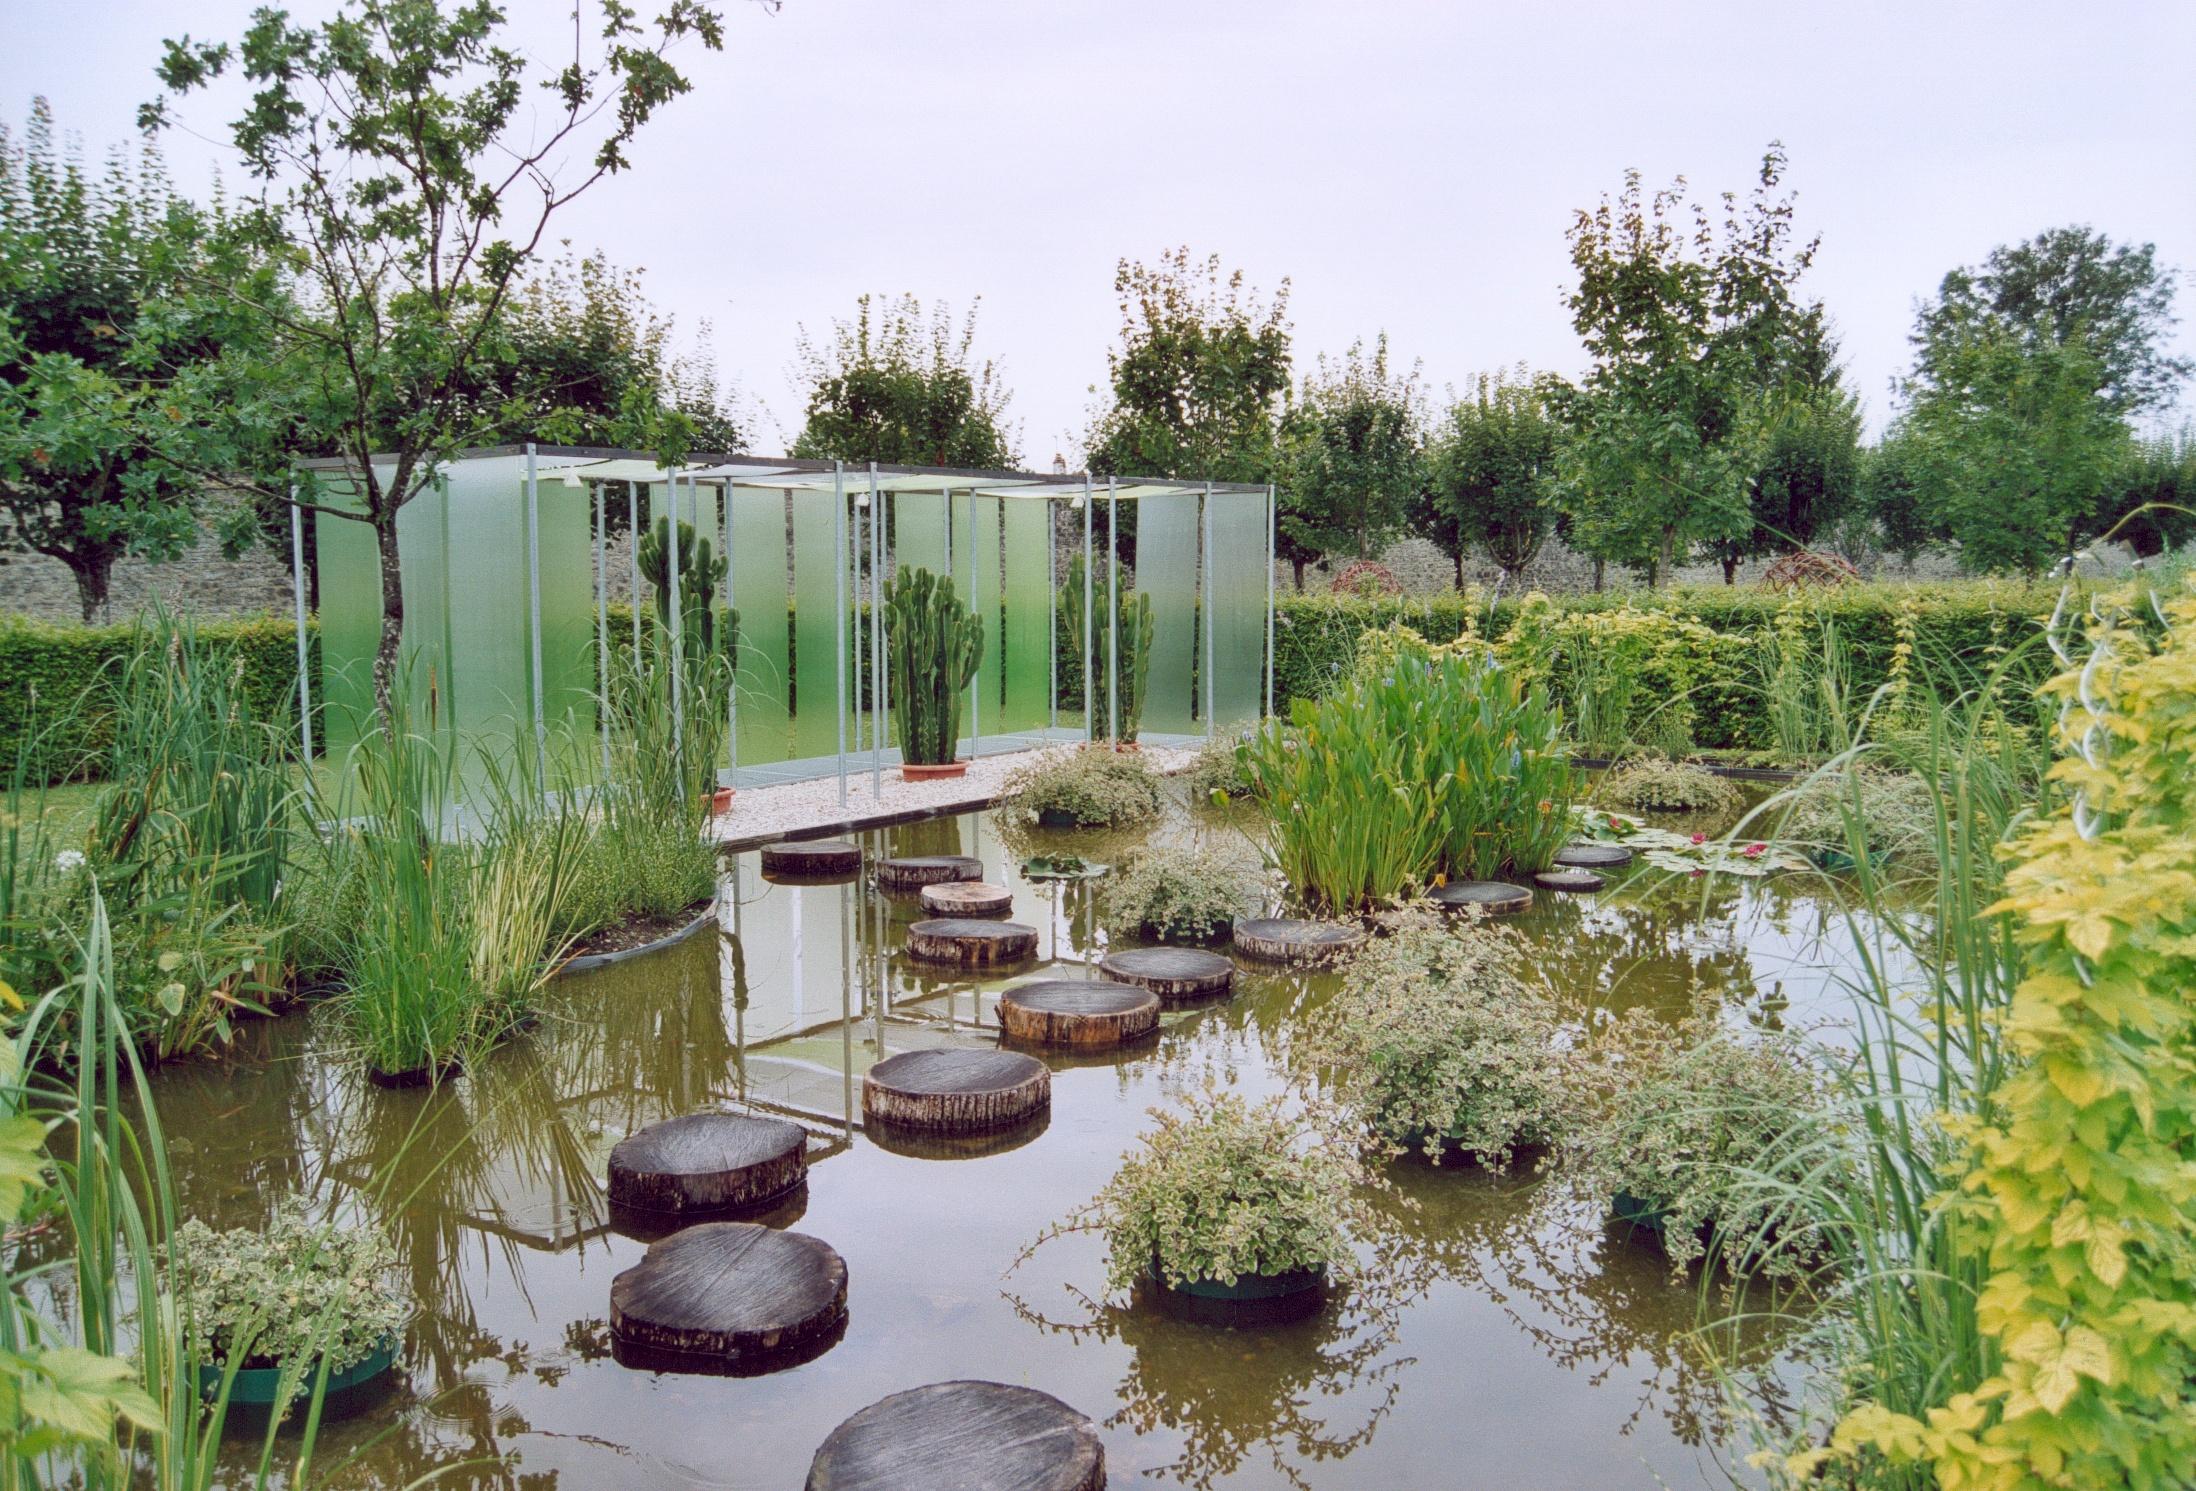 Ficheiro arc et senans jardin wikip dia a for Jardin wikipedia